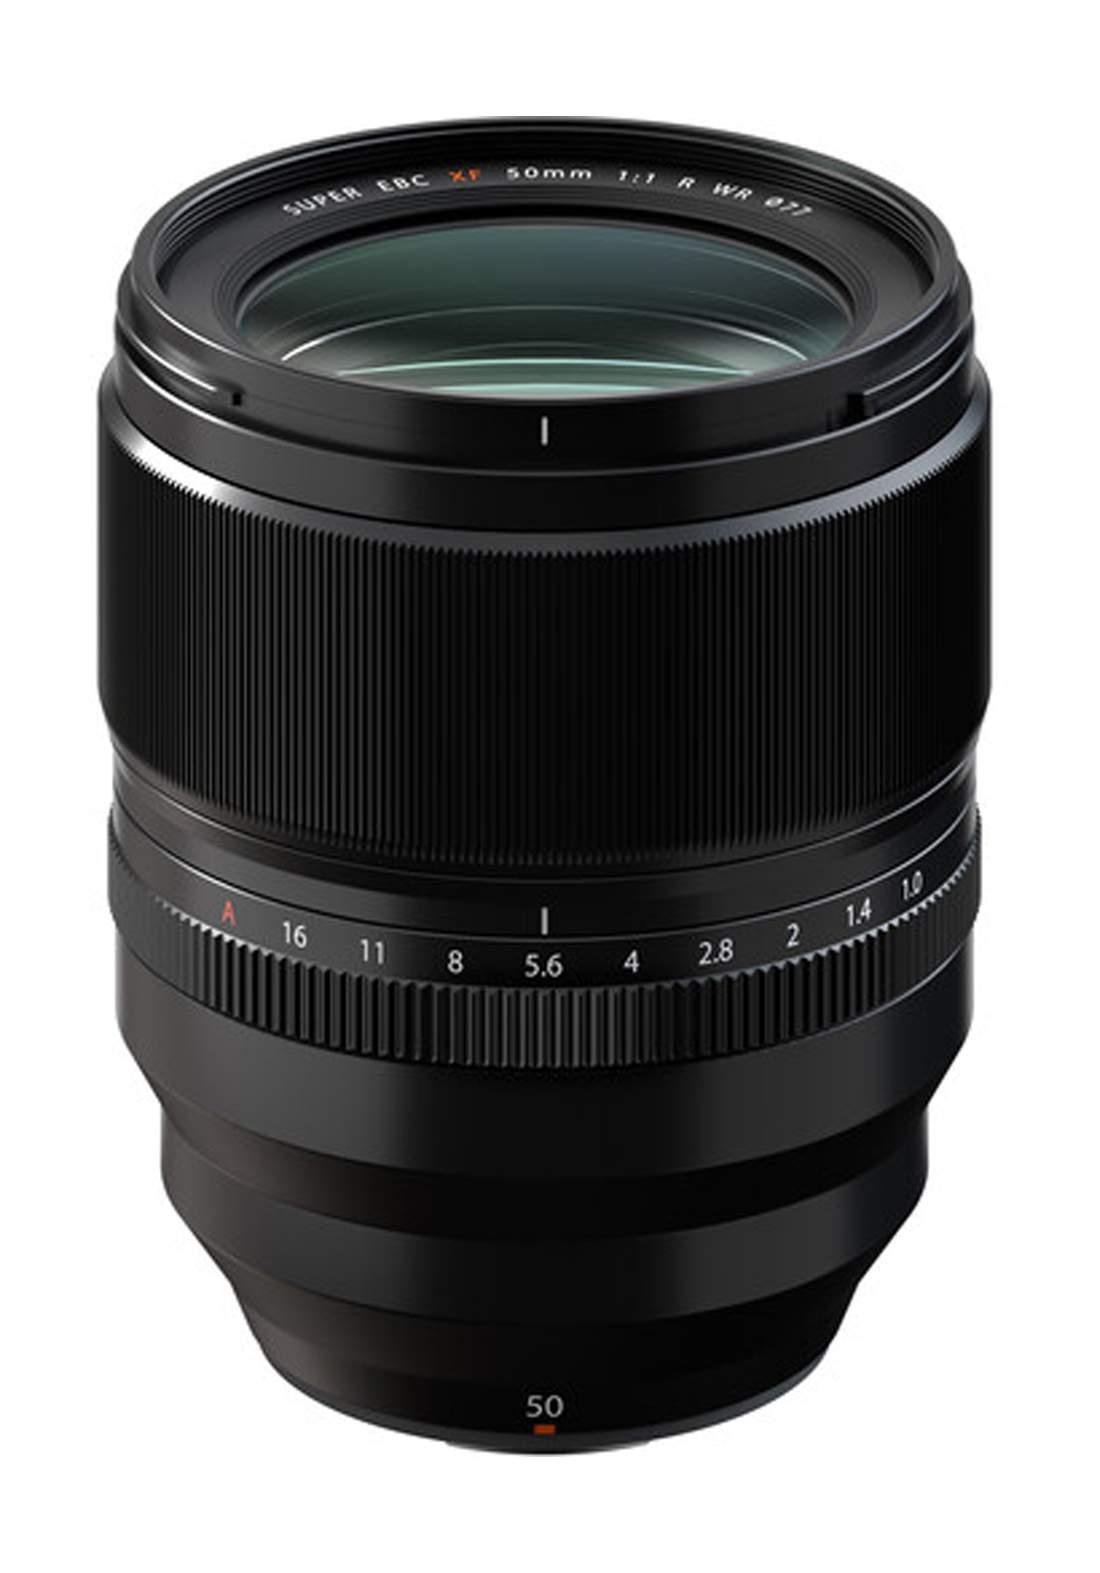 Fujifilm XF 50mm F1.0 R WR Lens  - Black عدسة كاميرا